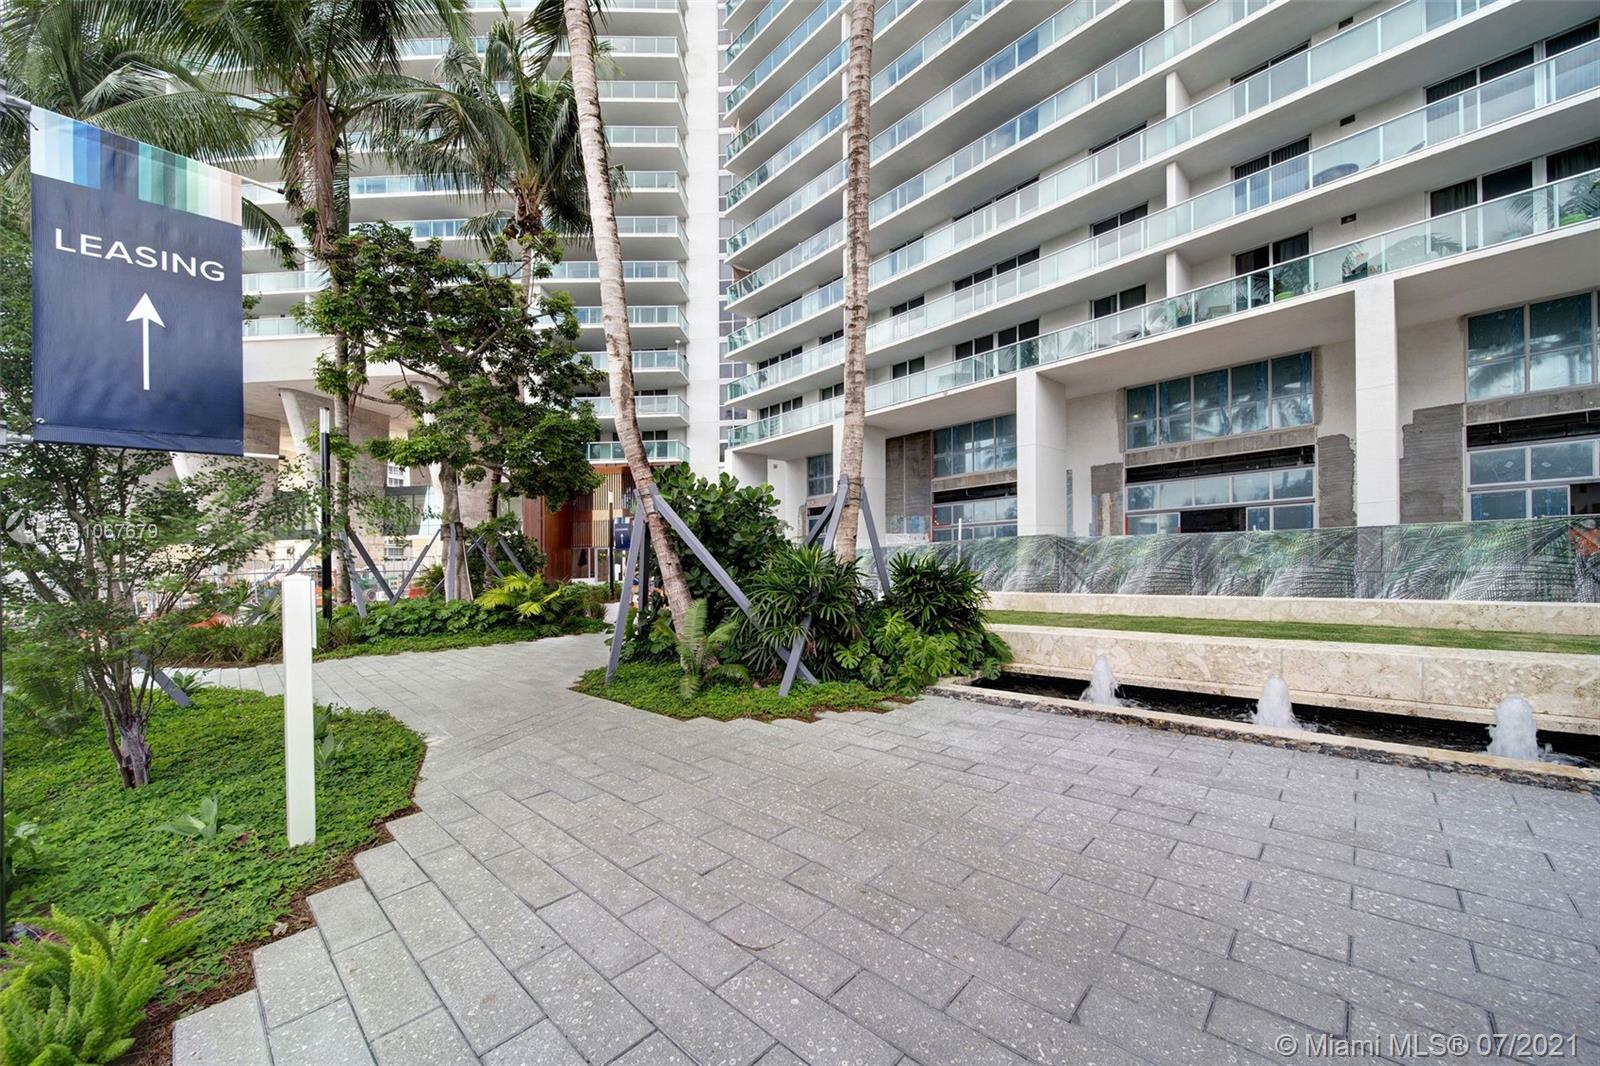 Flamingo South Beach #M-1022 - 50 - photo